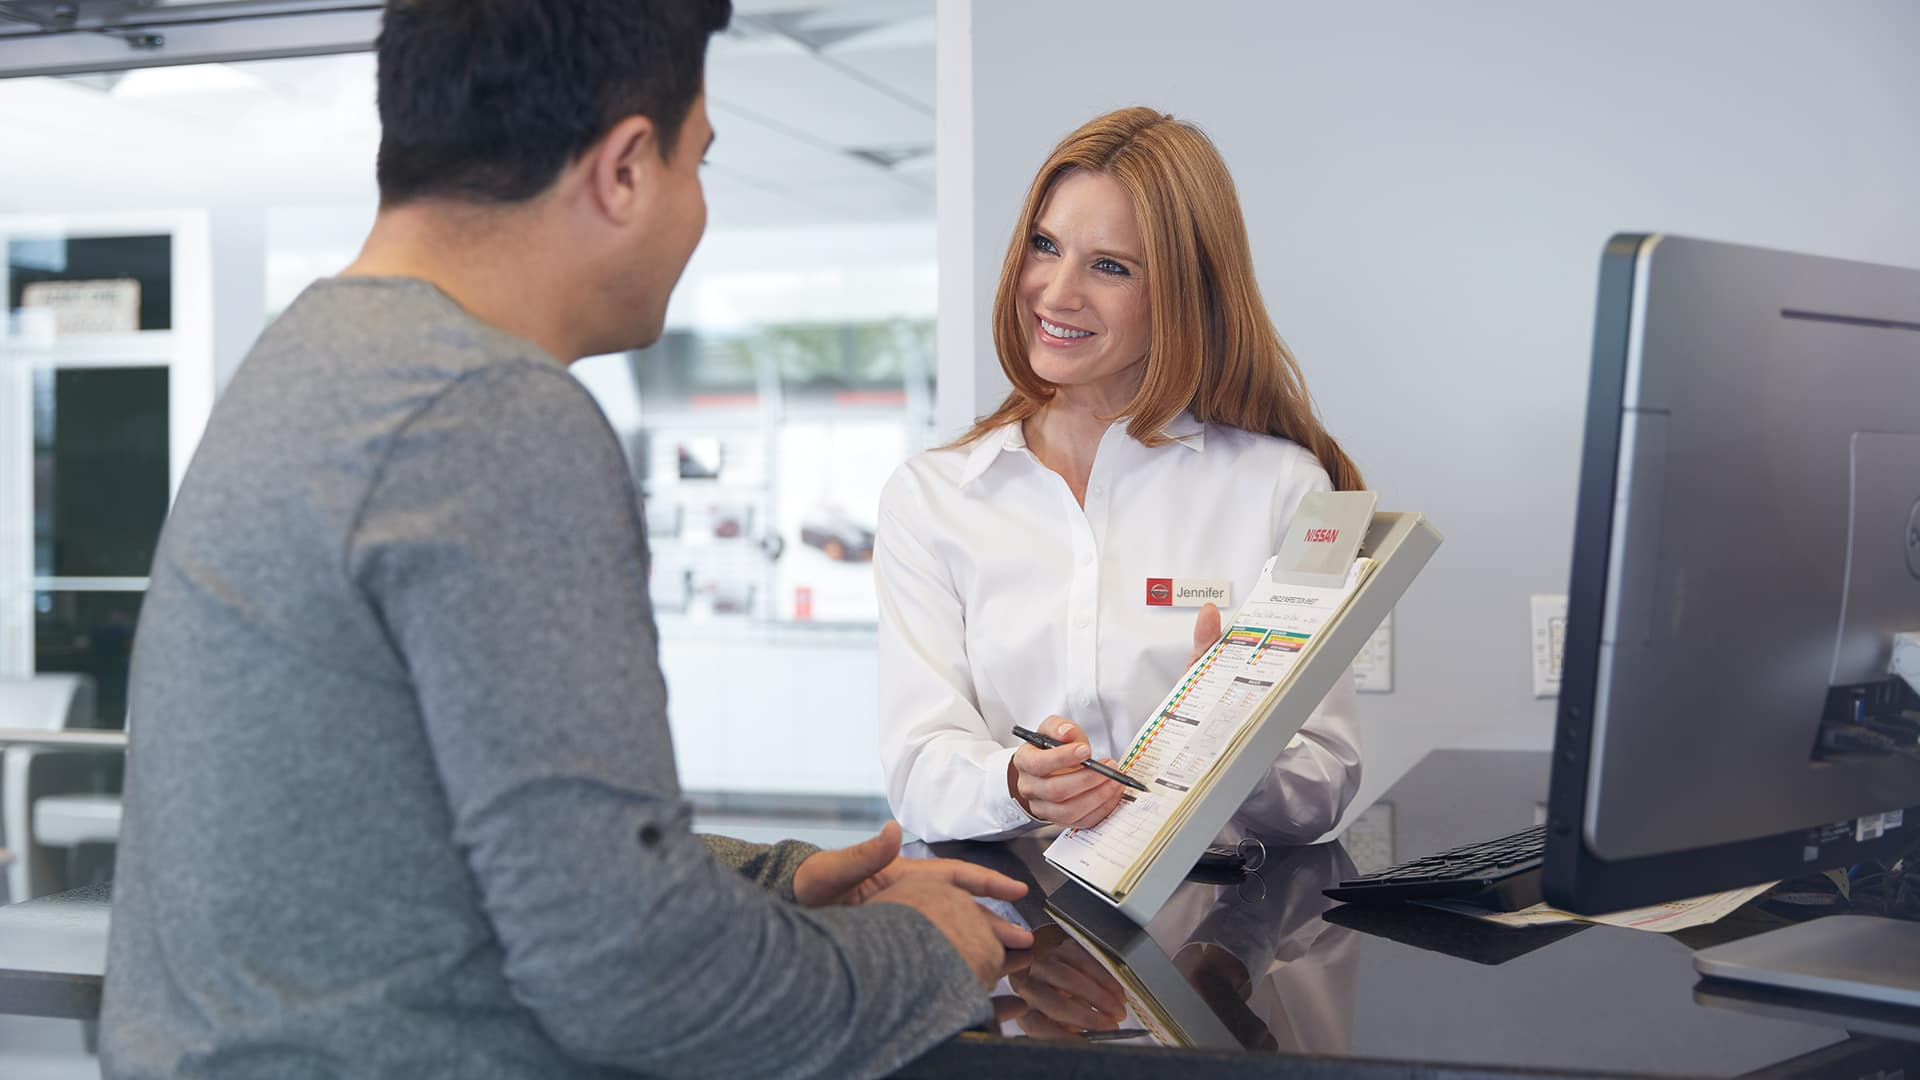 Nissan Boston is a Car Dealership near Boston MD | Nissan advisor showing a customer pricing options